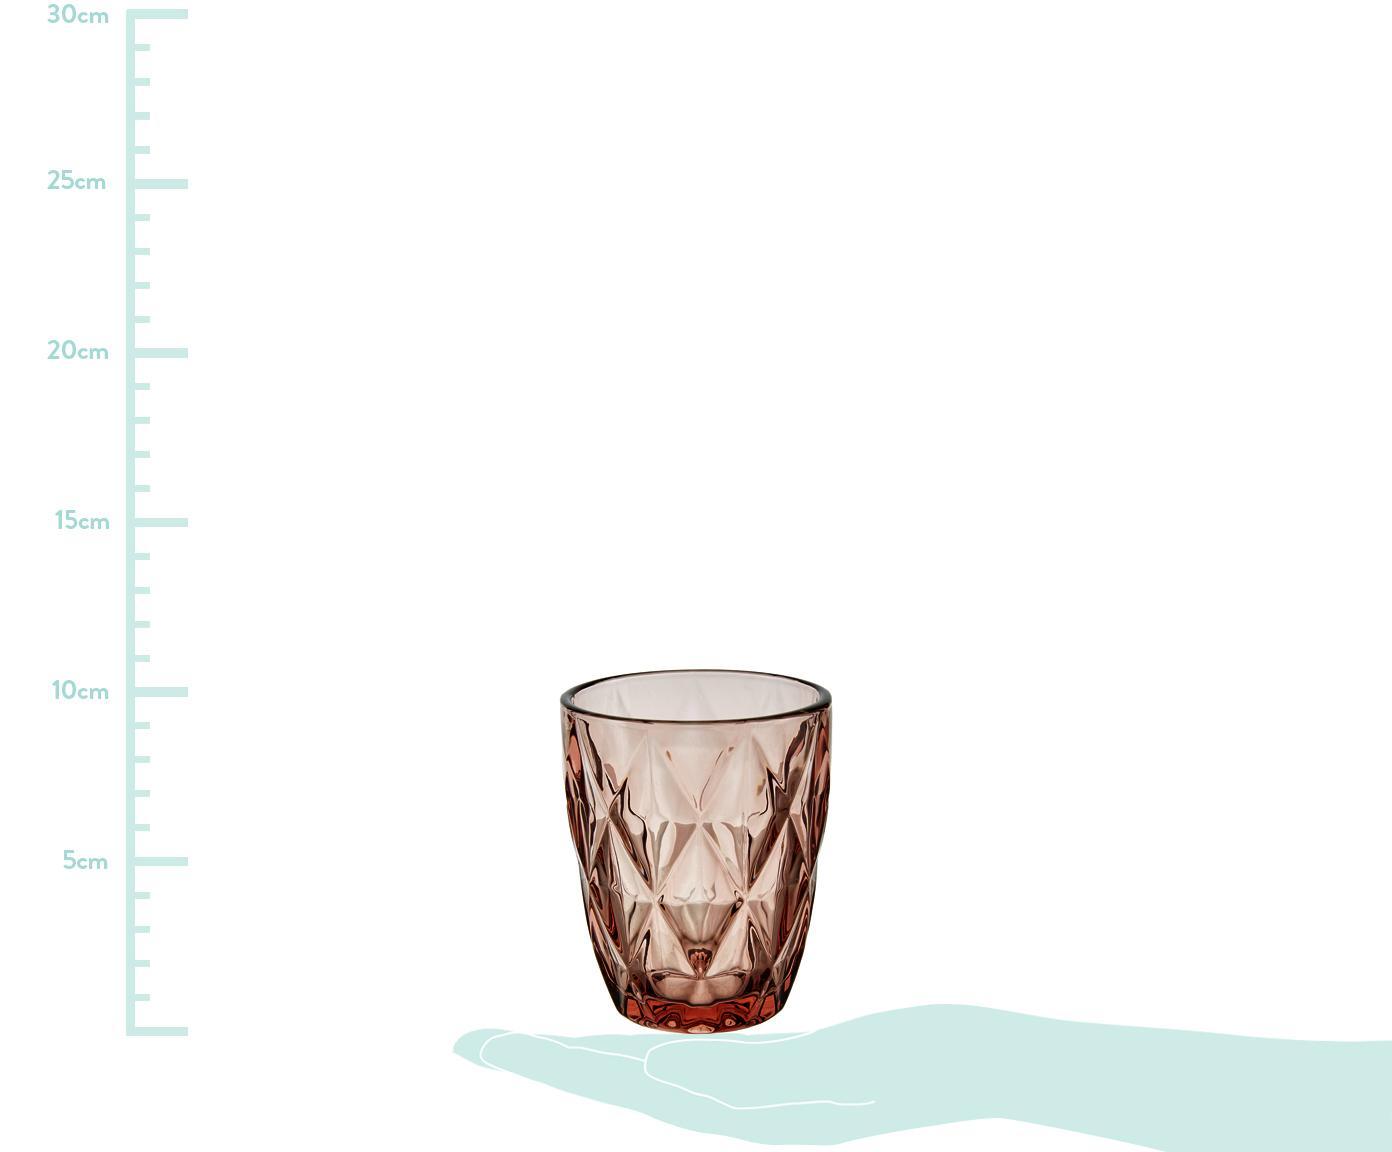 Wassergläser Colorado mit Strukturmuster, 4 Stück, Glas, Rosa, Transparent, ∅ 8 x H 10 cm